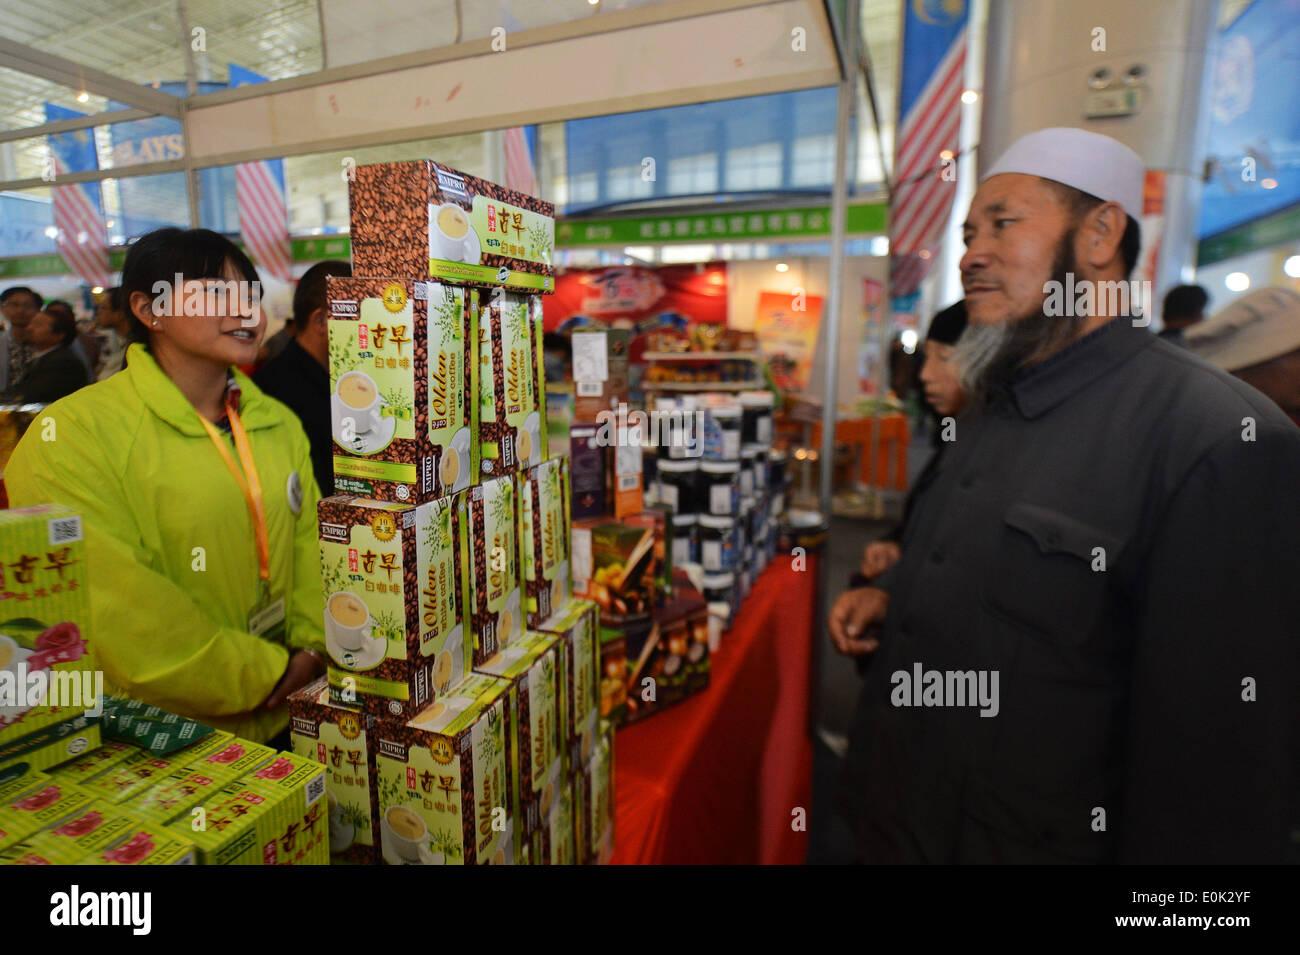 Exhibition Stand Staff : Chinese staff seen stand siemens exhibition shanghai china